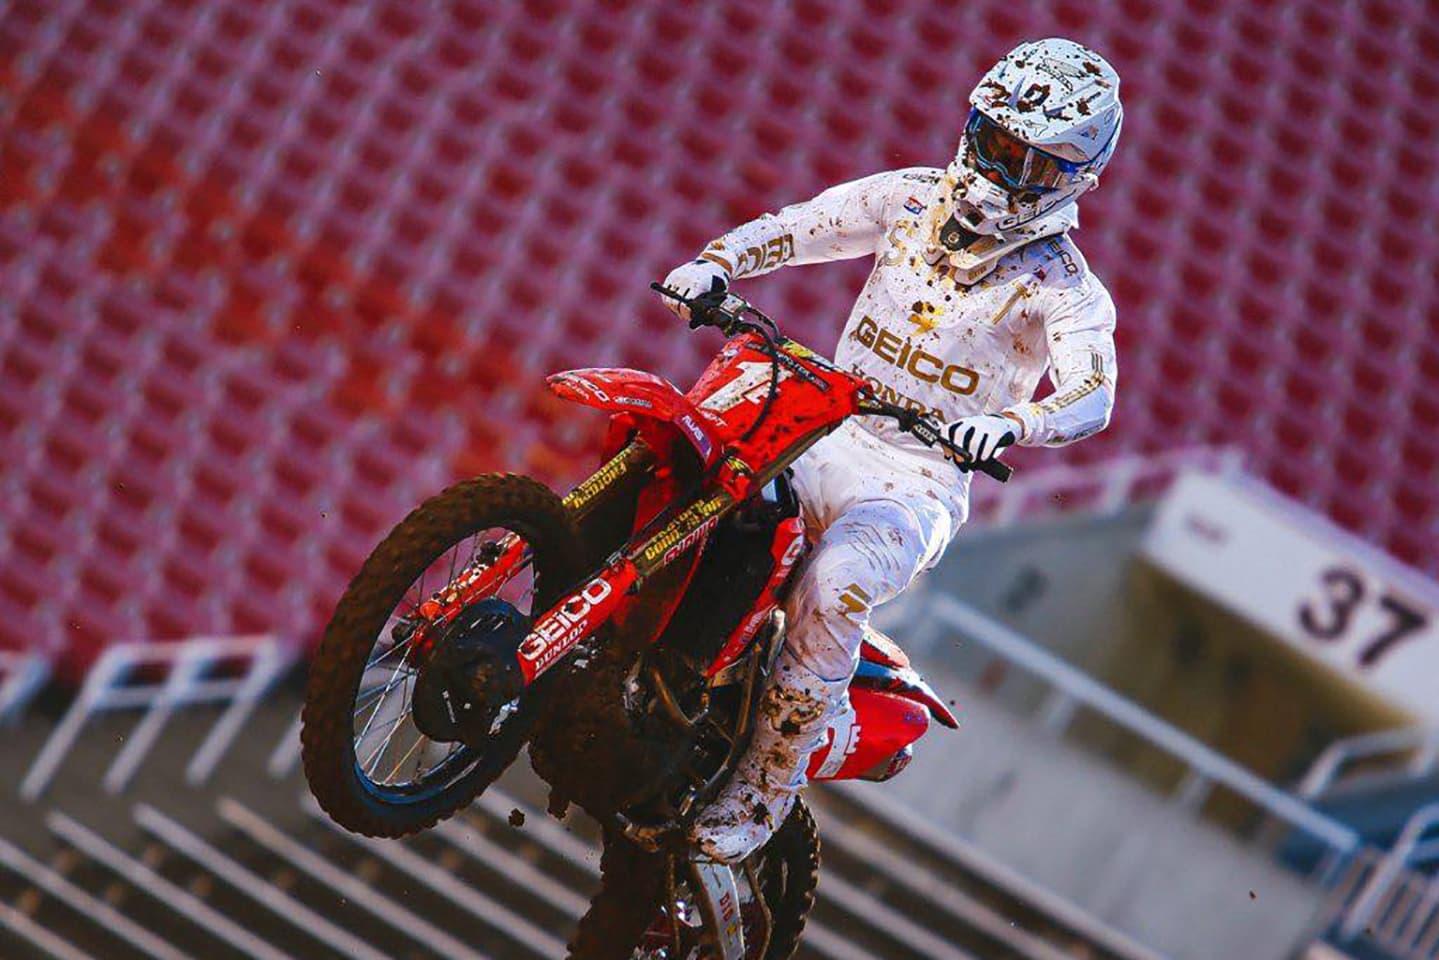 Salt Lake City 7 – Ergebnis 250SX Ost/West-Showdown